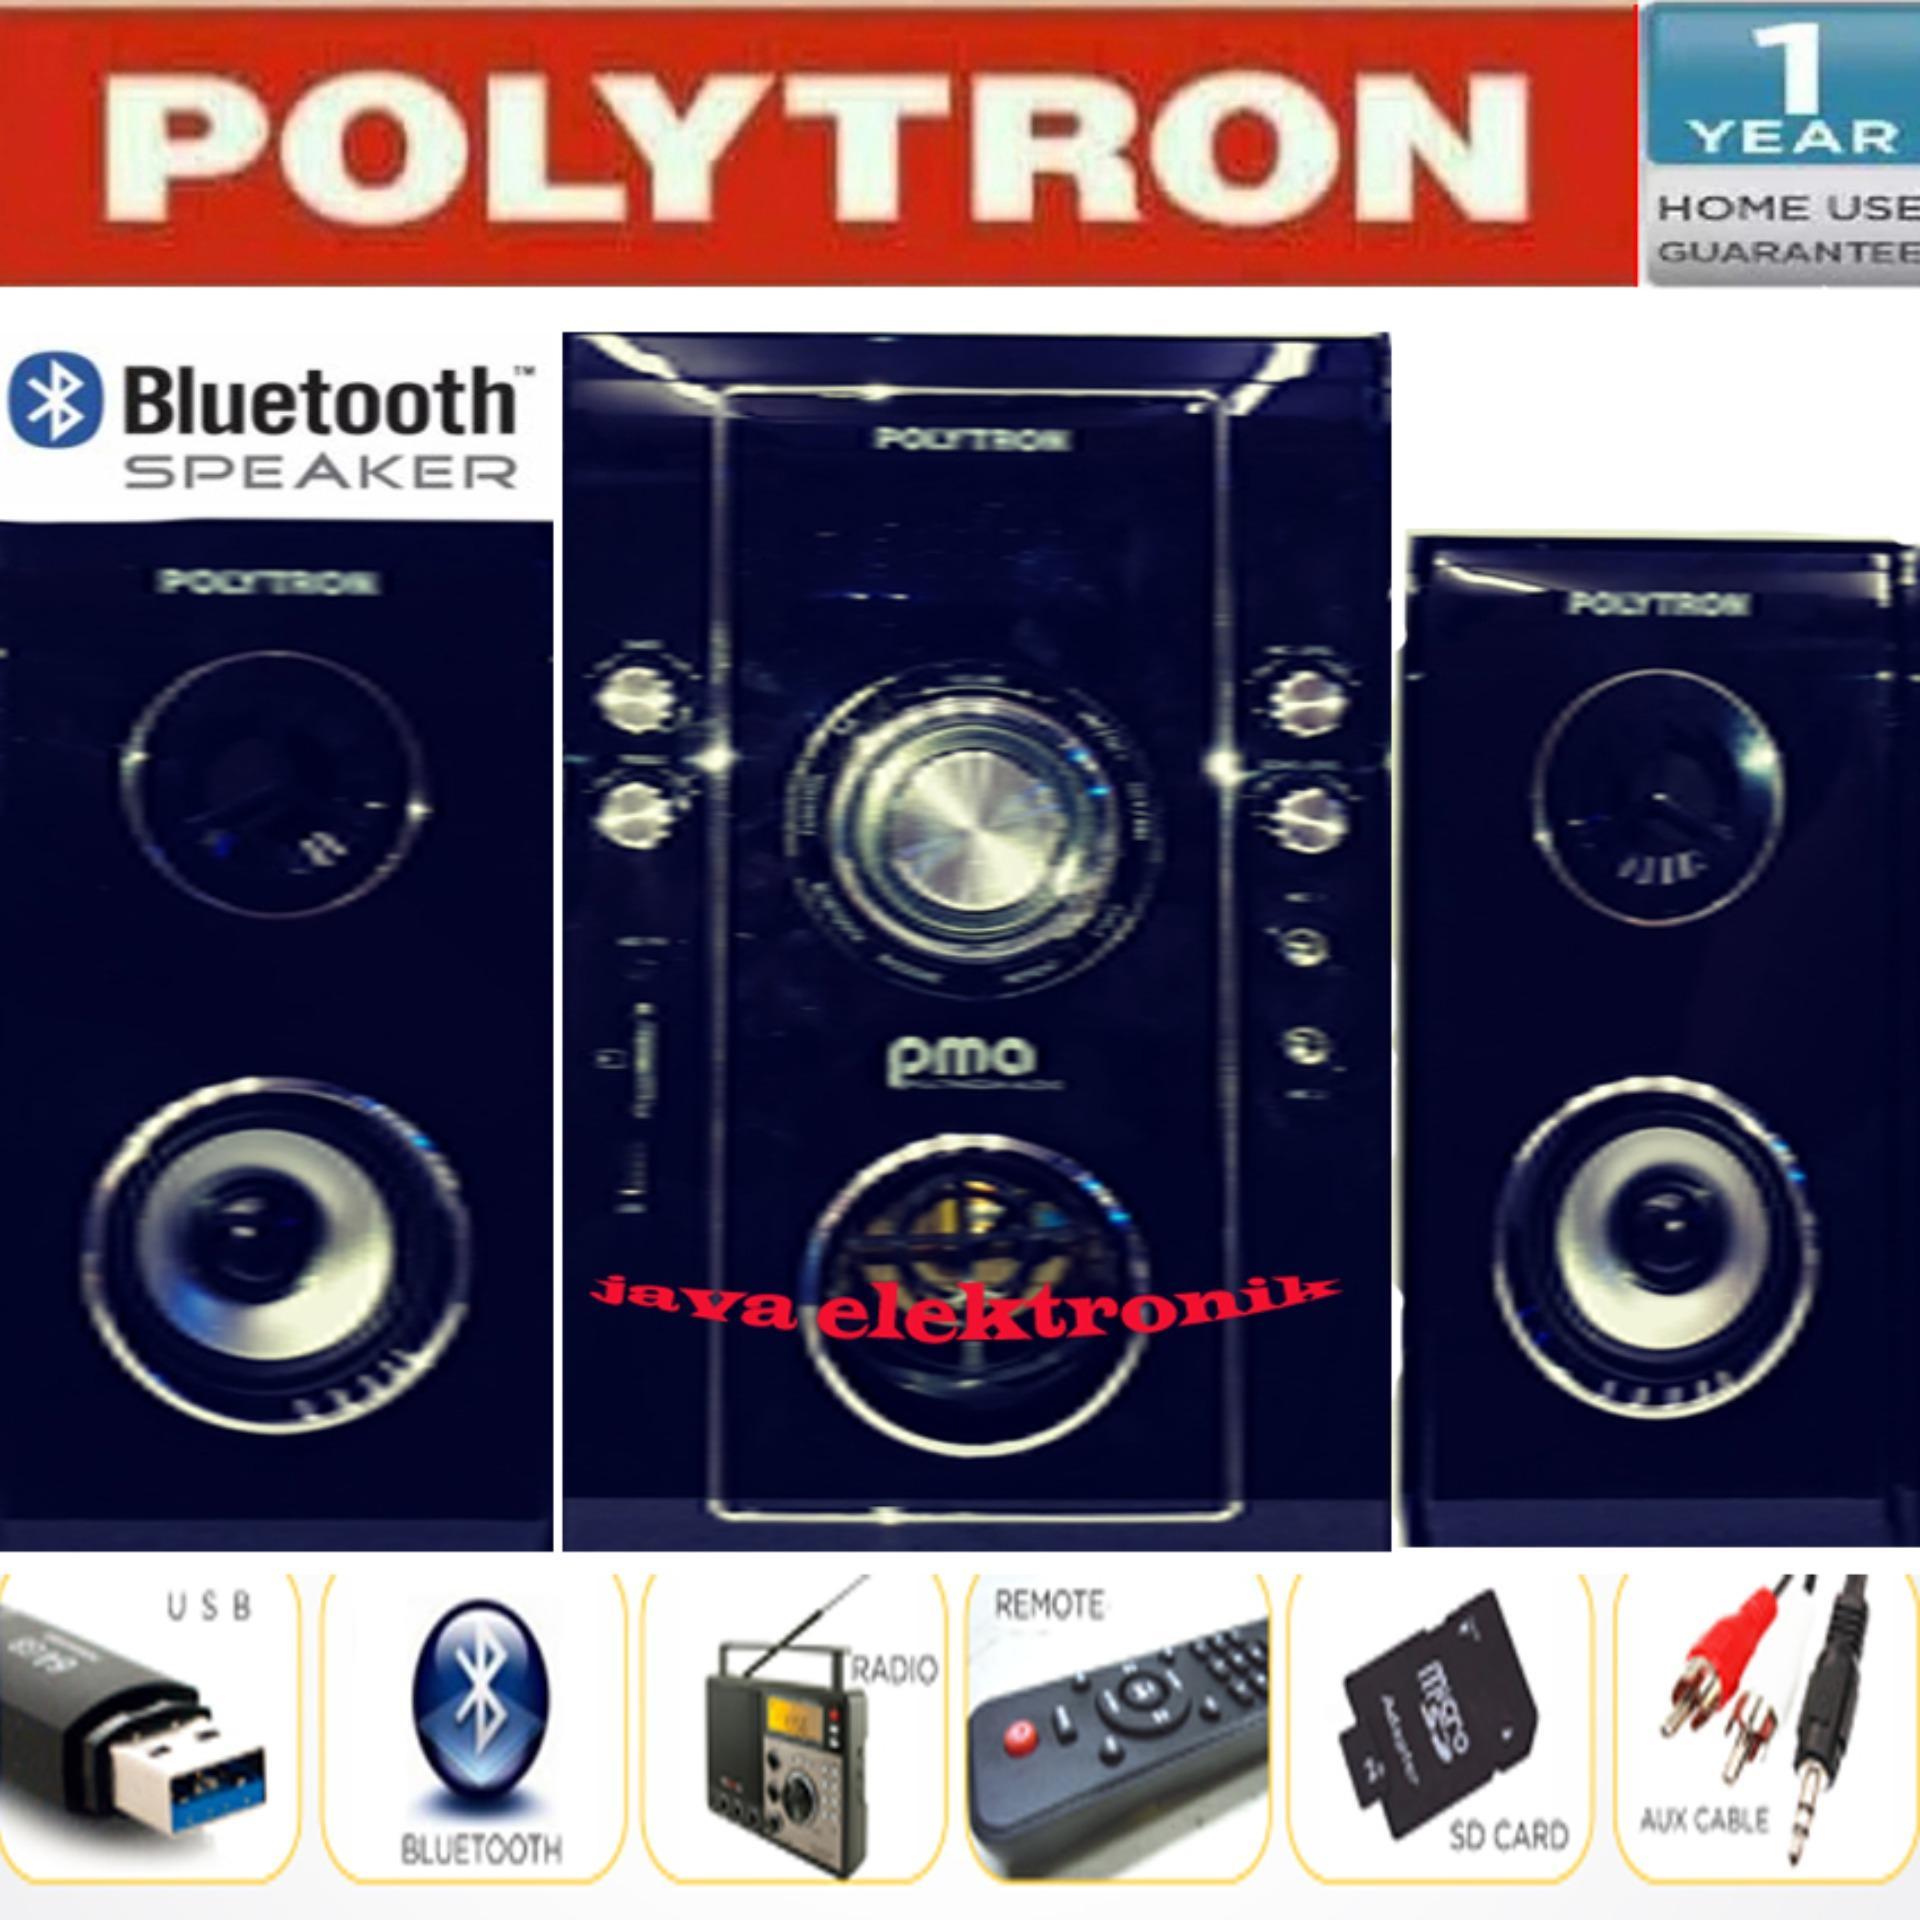 Polytron Promo Sepeker Warlles Suara Bass Pma9503 Coklat Garansi Resmi By Java Elektronik.